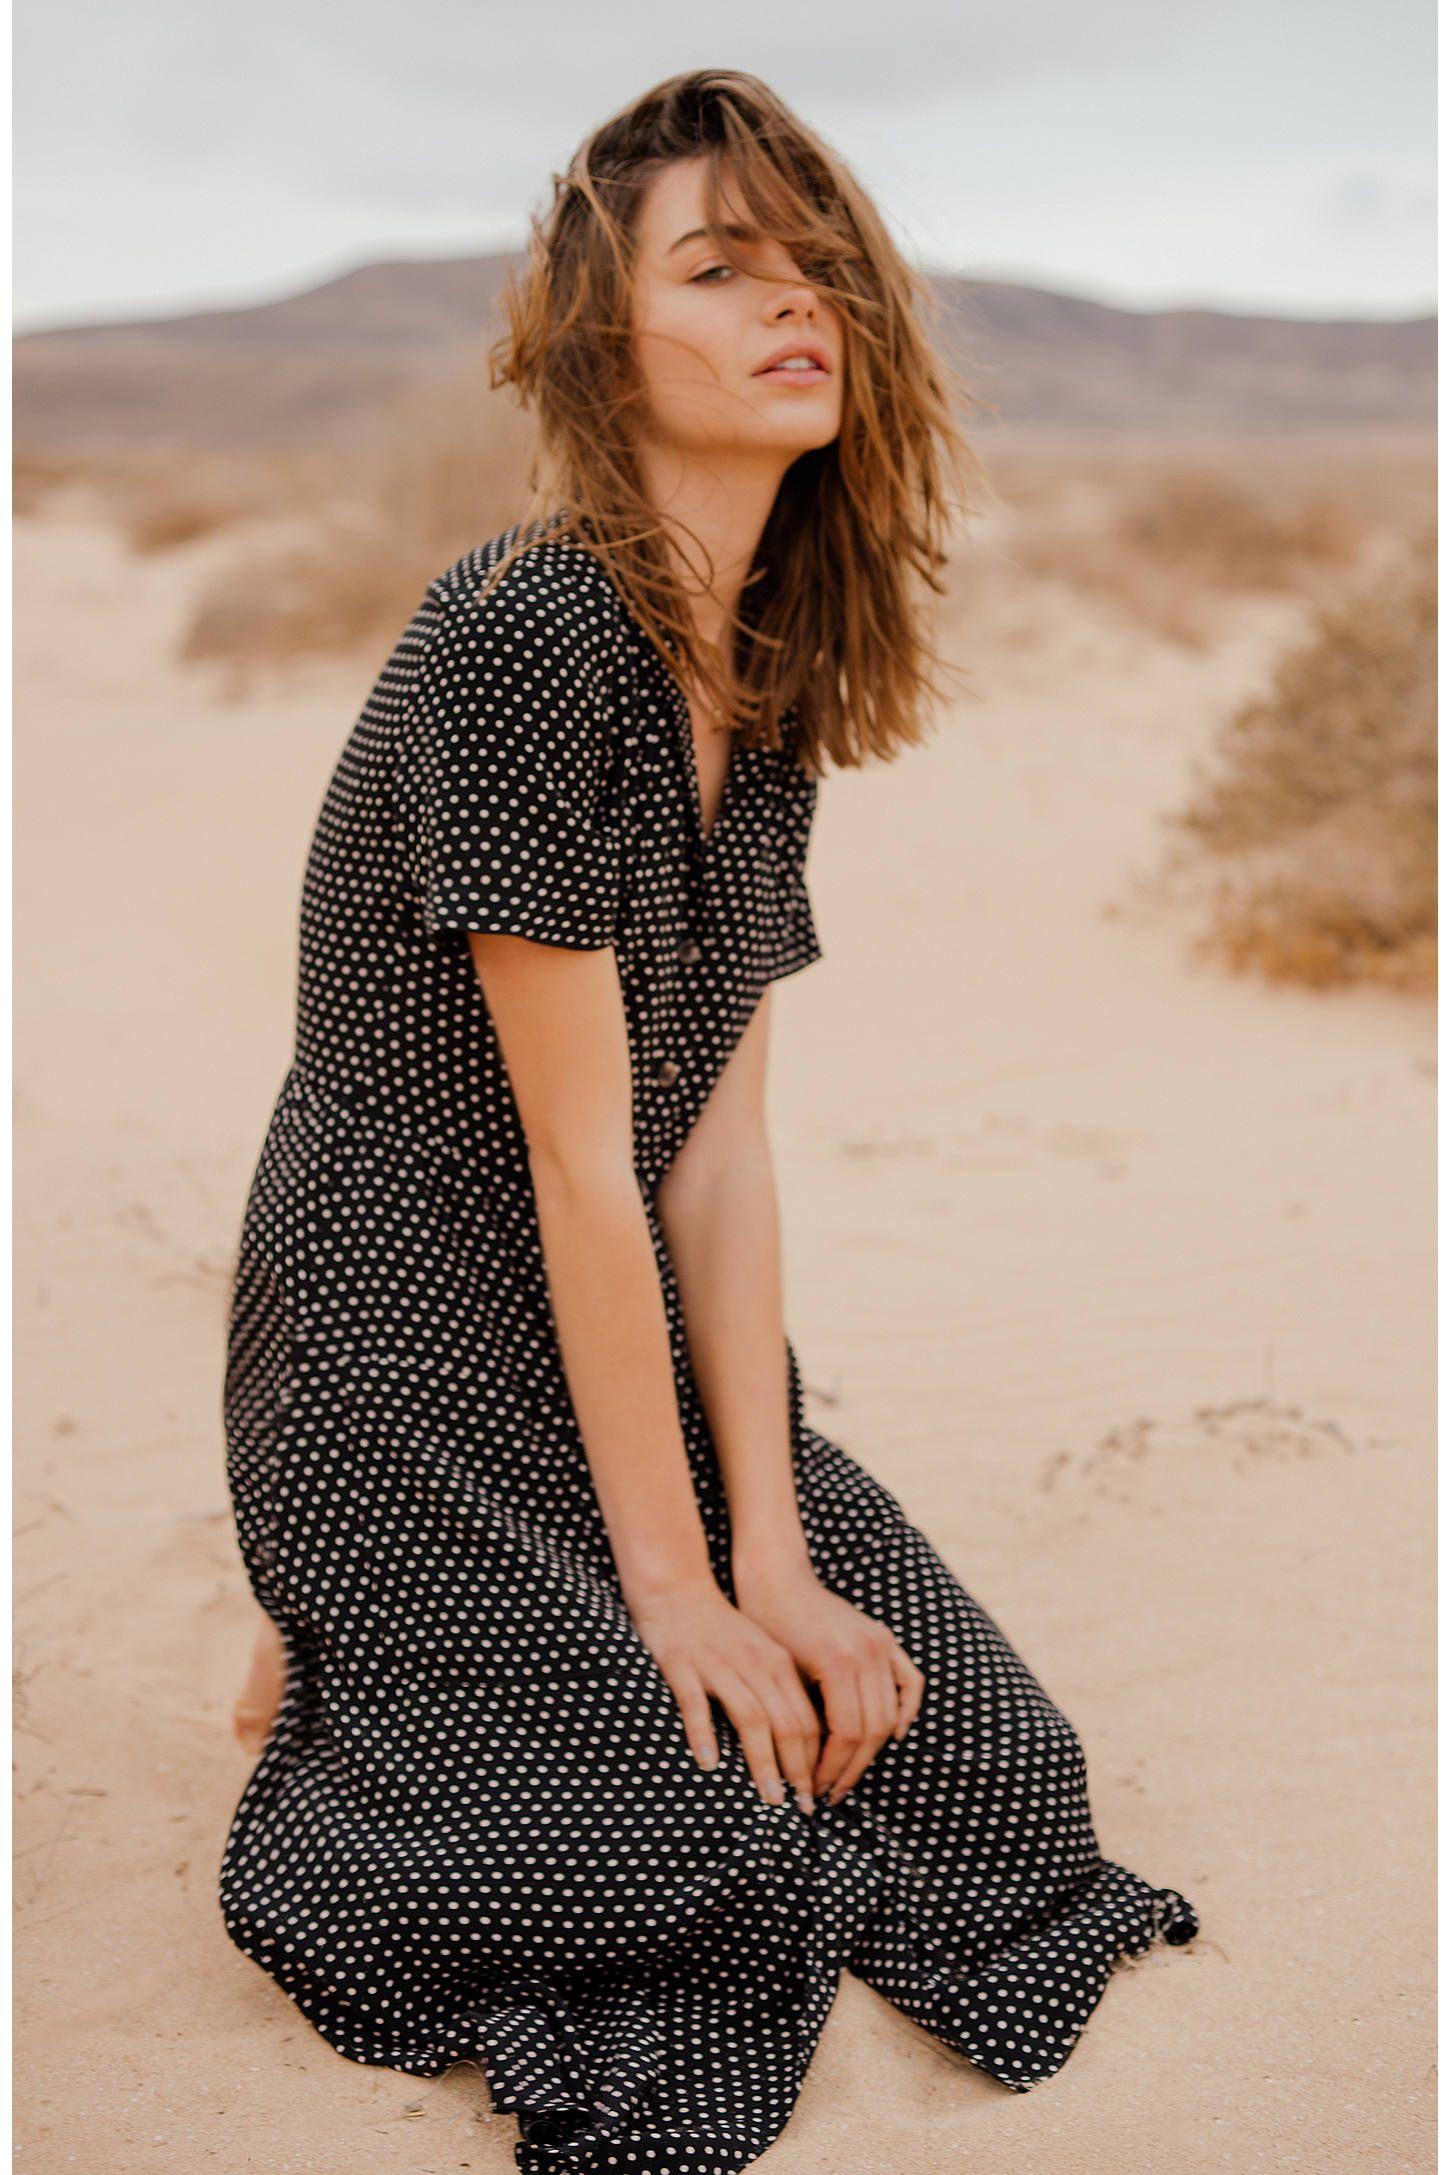 Pins And Needles Clothing Pleasing Shop Pins & Needles Polka Dot Midi Shirt Dress At Urban Outfitters Decorating Inspiration